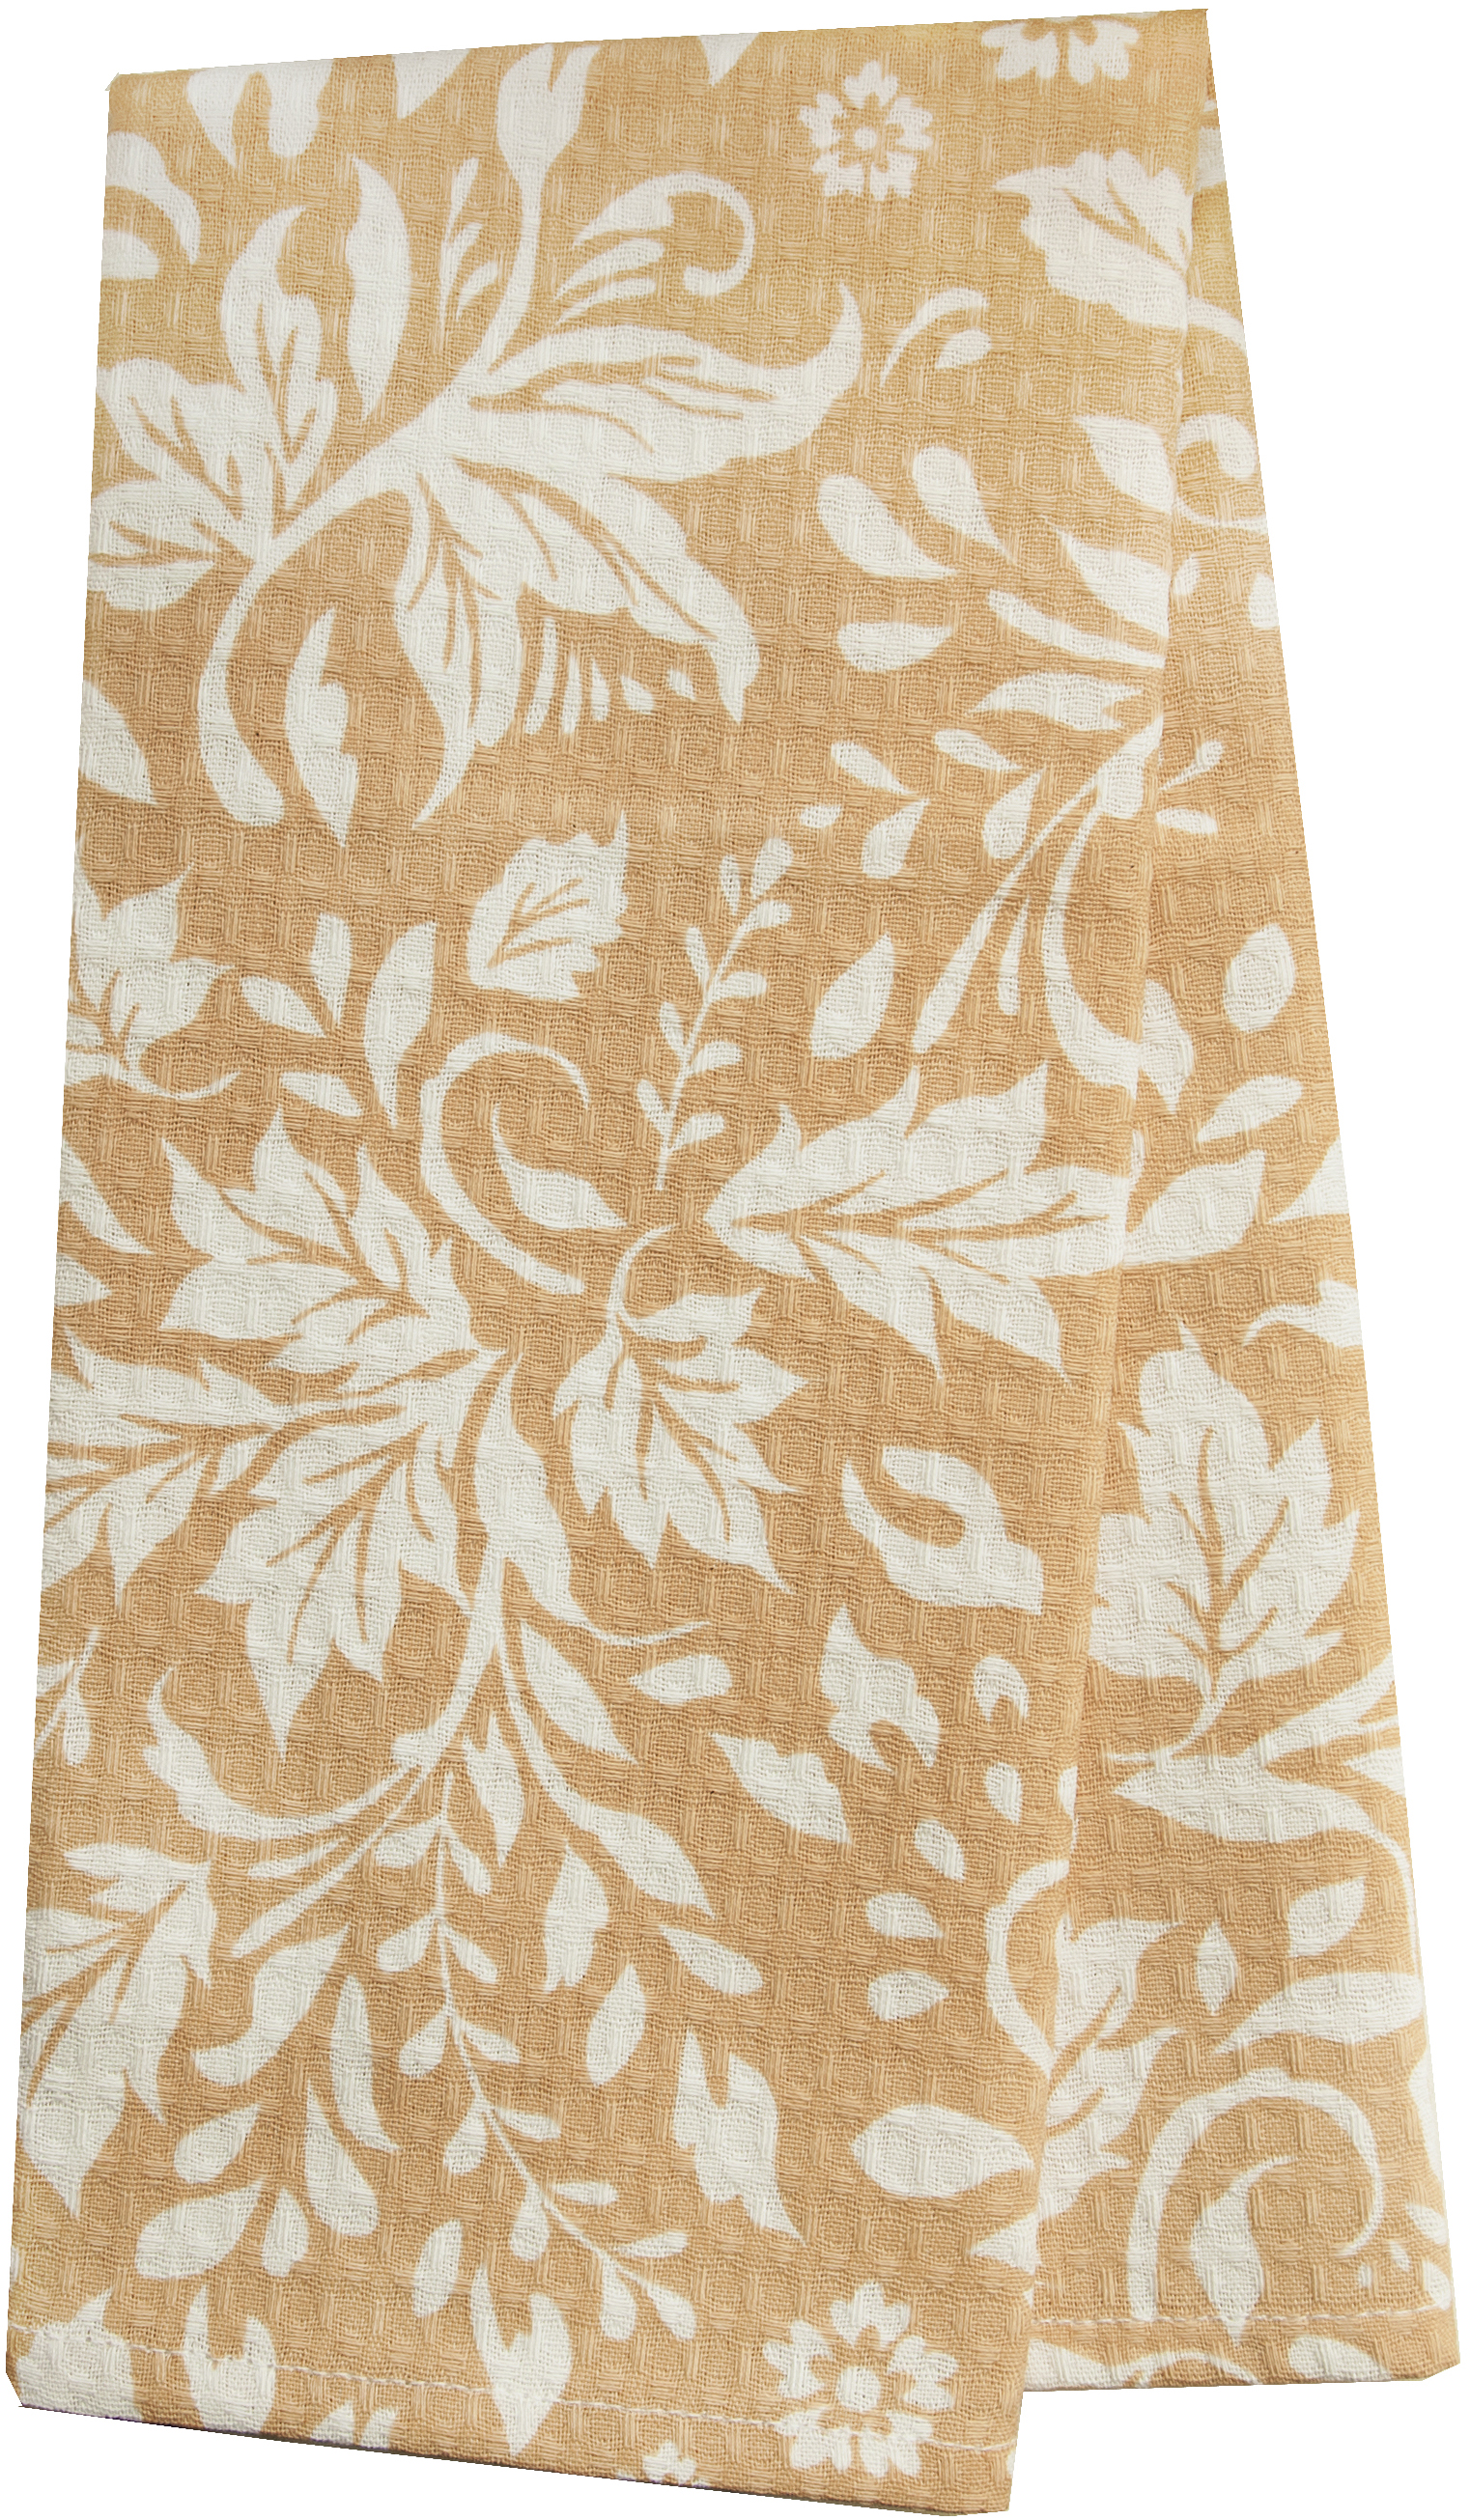 Полотенце кухонное Bonita Белые росы, цвет: белый, бежевый, 35 х 61 см романтика кухонное полотенце розовый ноктюрн 40х50 см 2 шт